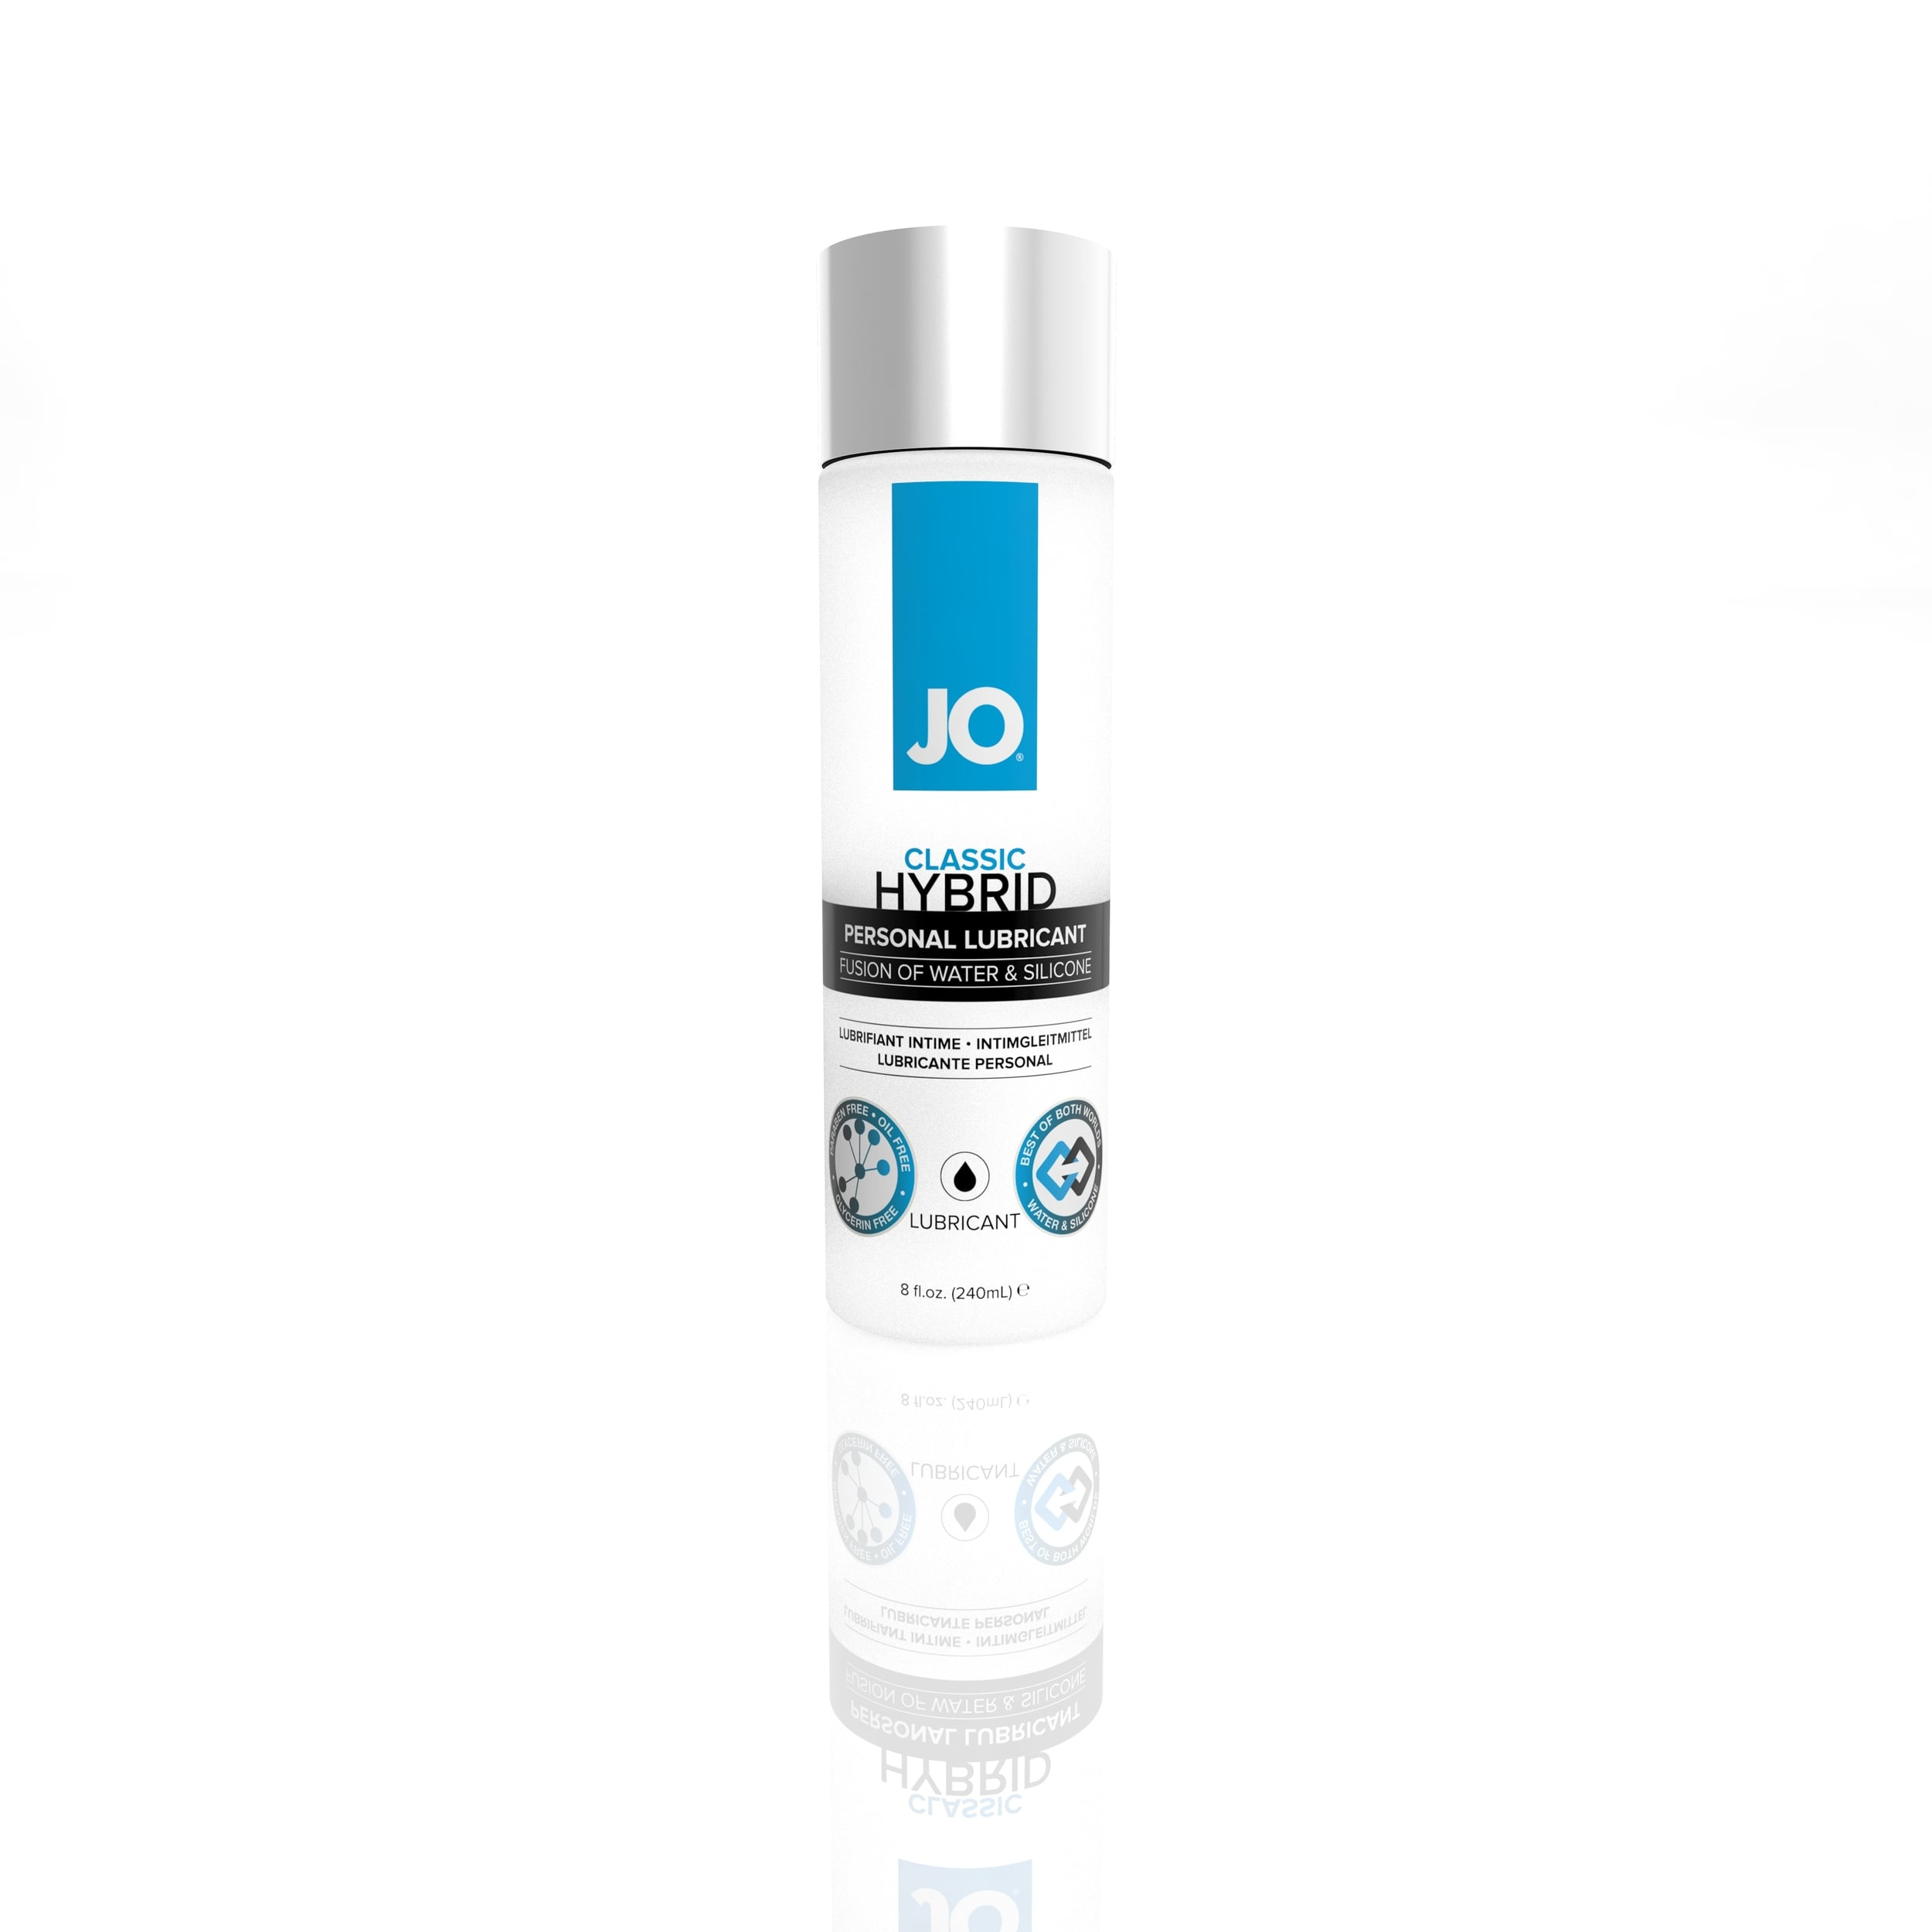 40203 - JO CLASSIC HYBRID LUBRICANT - WATER-SILICONE FUSION - ORIGINAL - 8fl.oz240mL.jpg